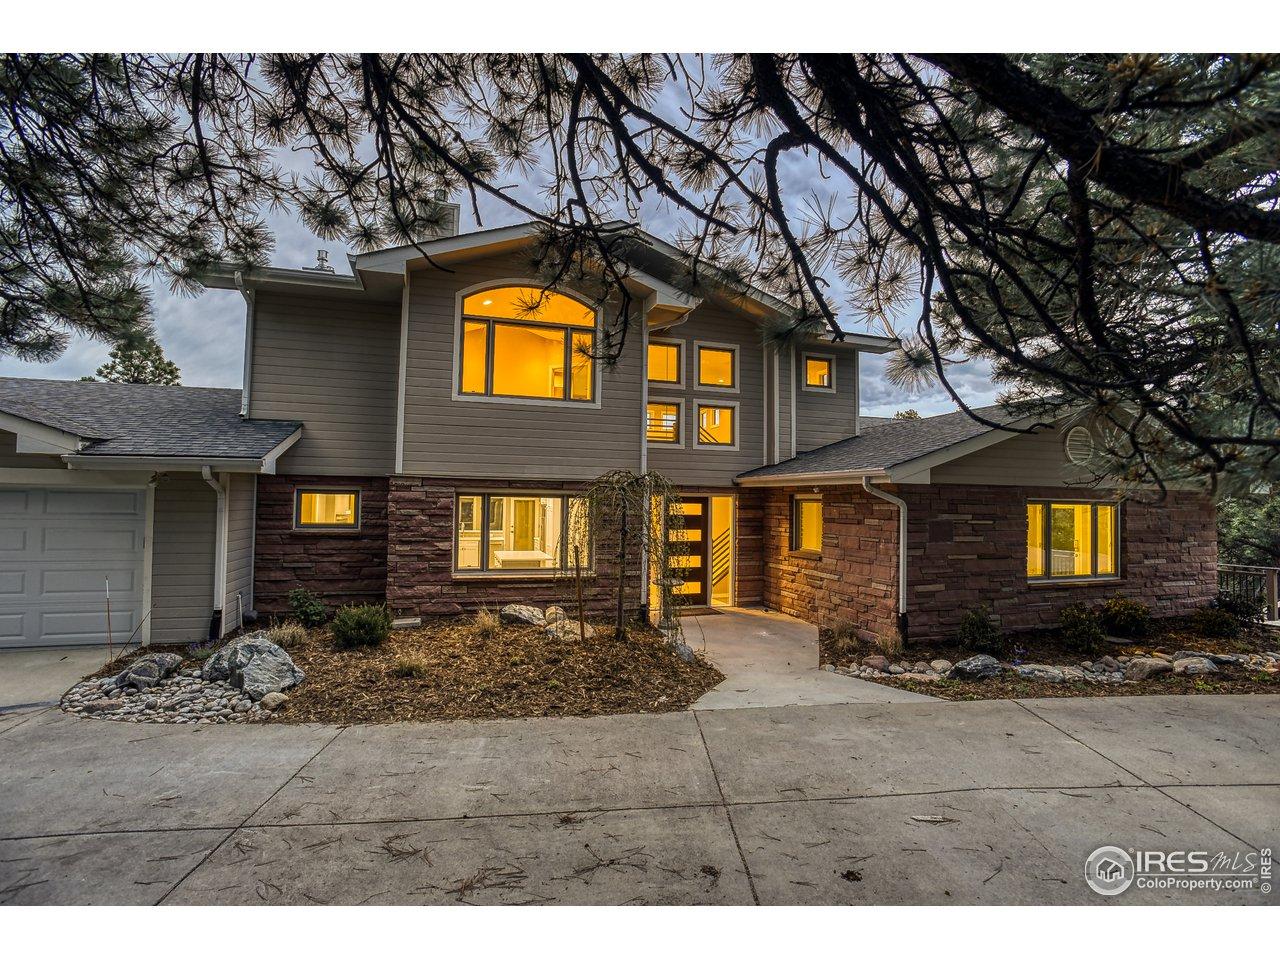 1754 Timber Ln, Boulder CO 80304